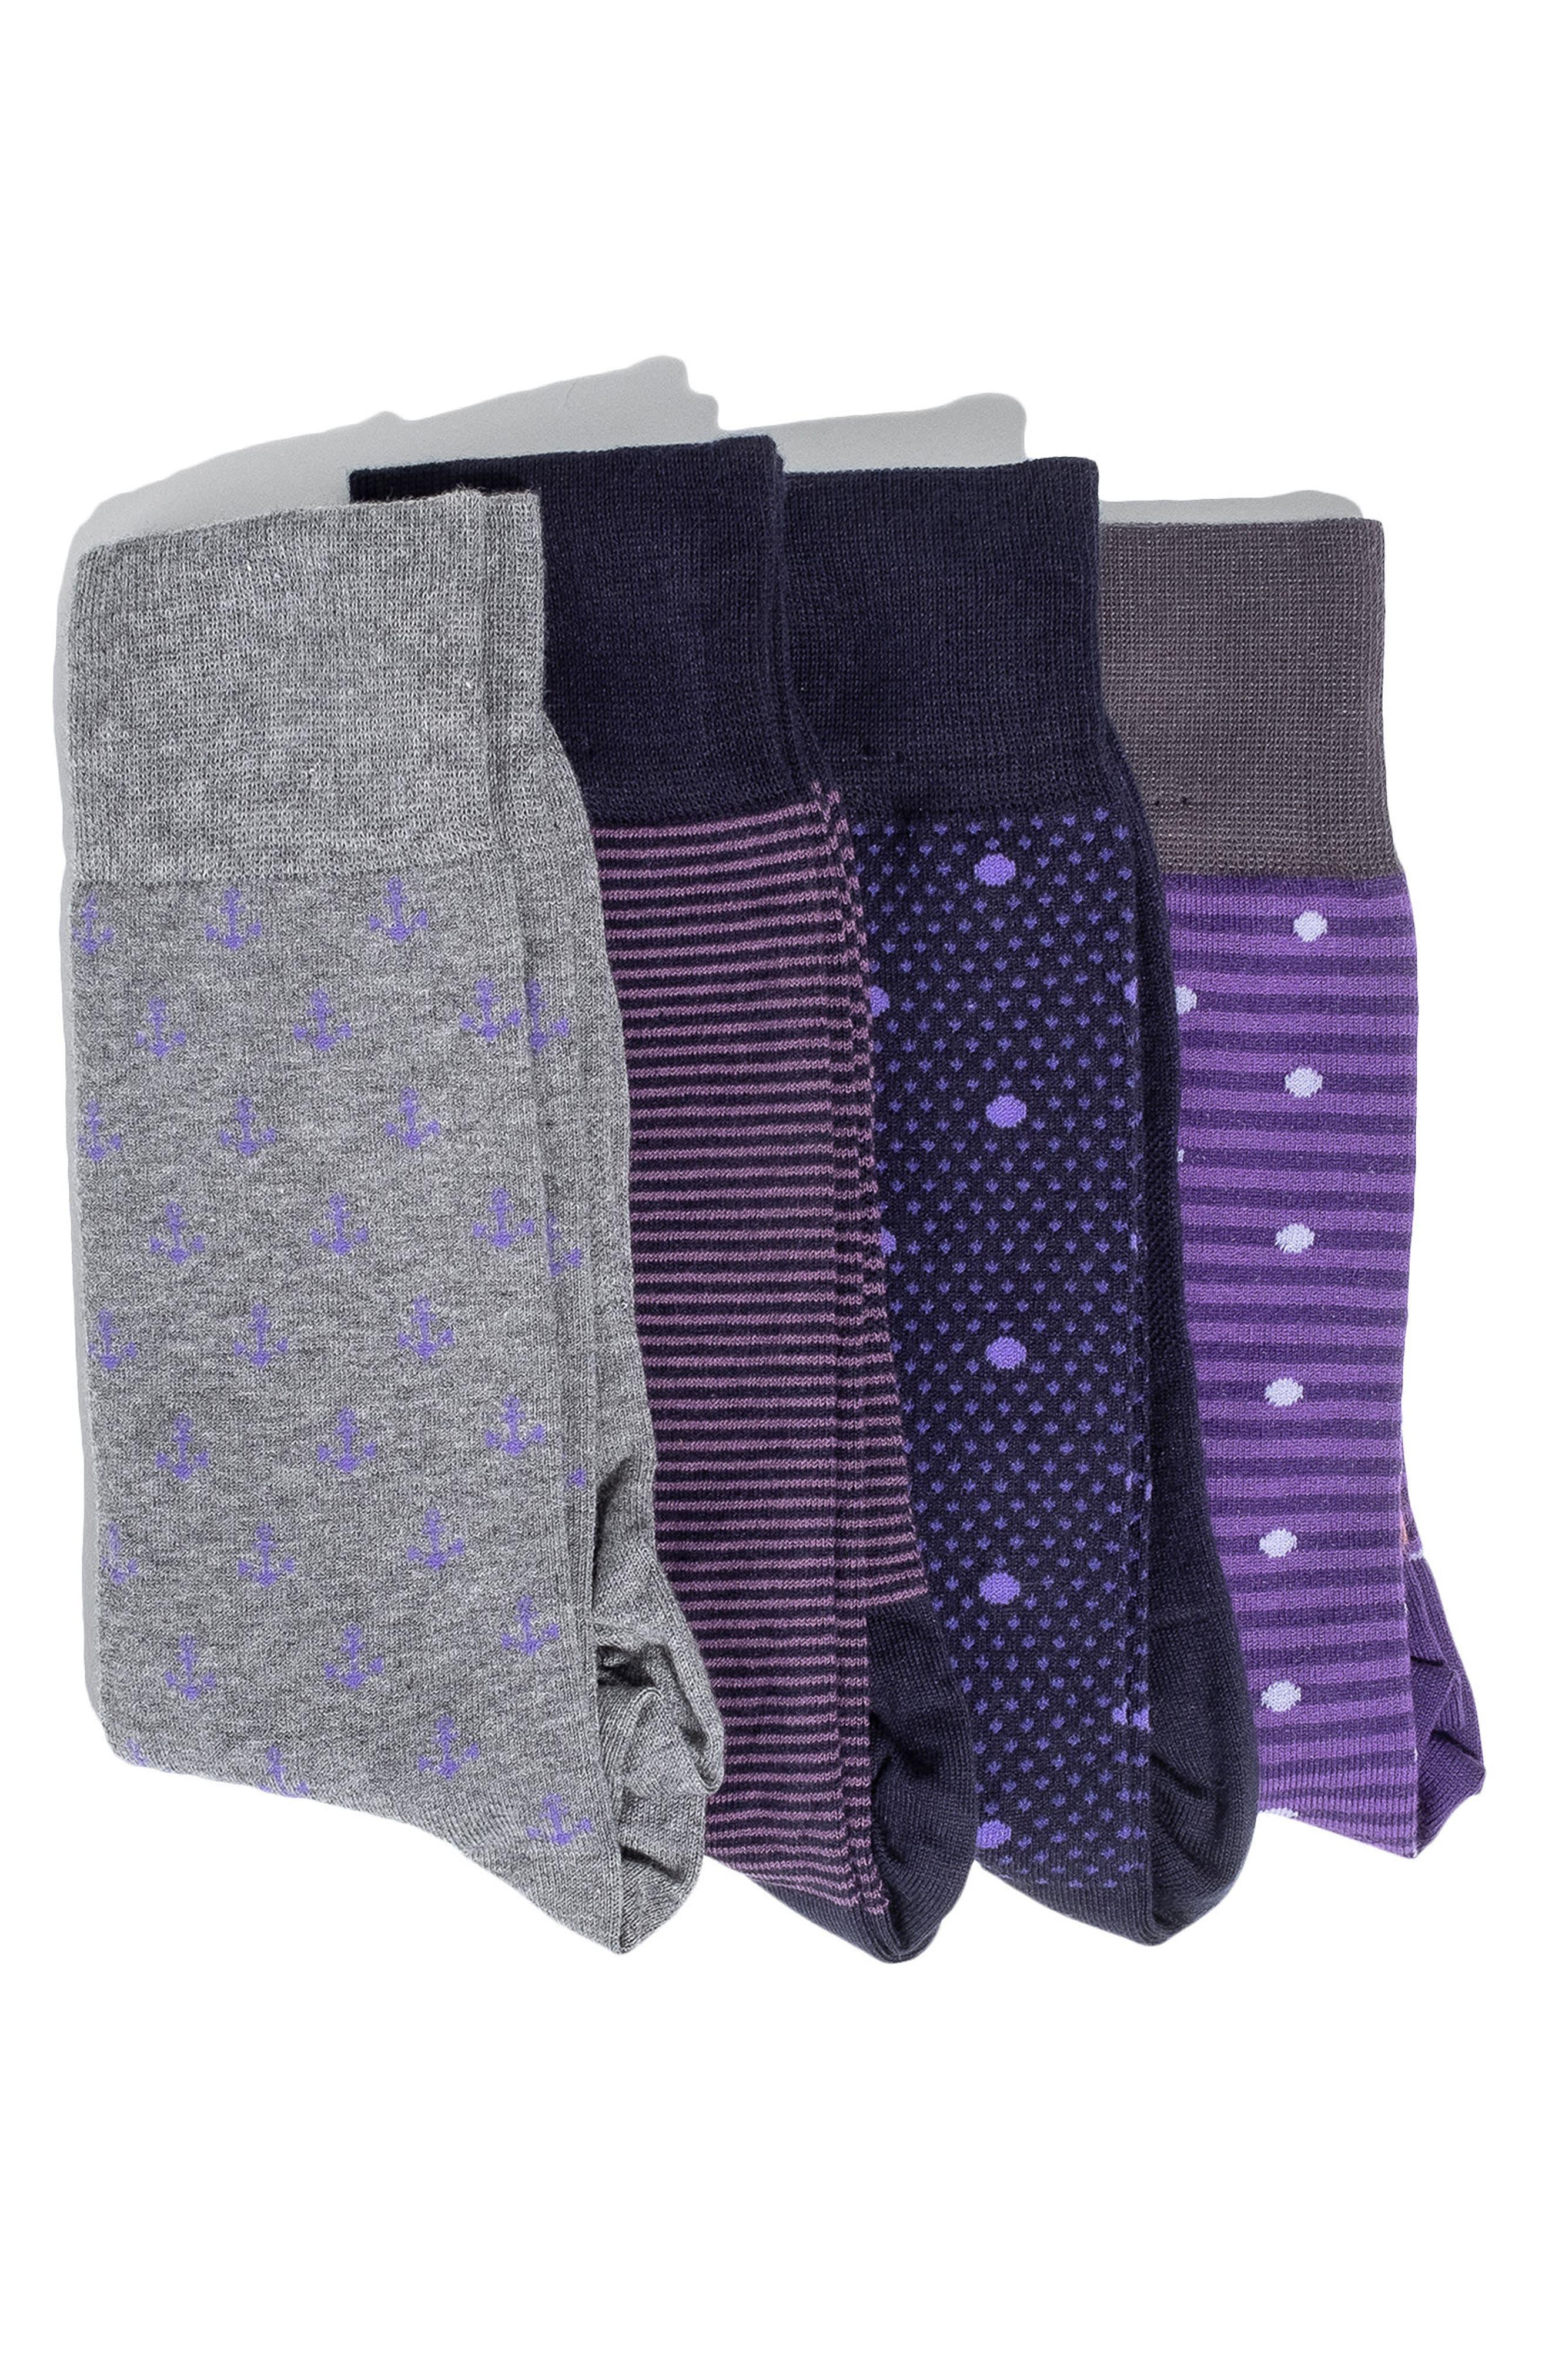 4-Pack Socks,                             Main thumbnail 1, color,                             PURPLE